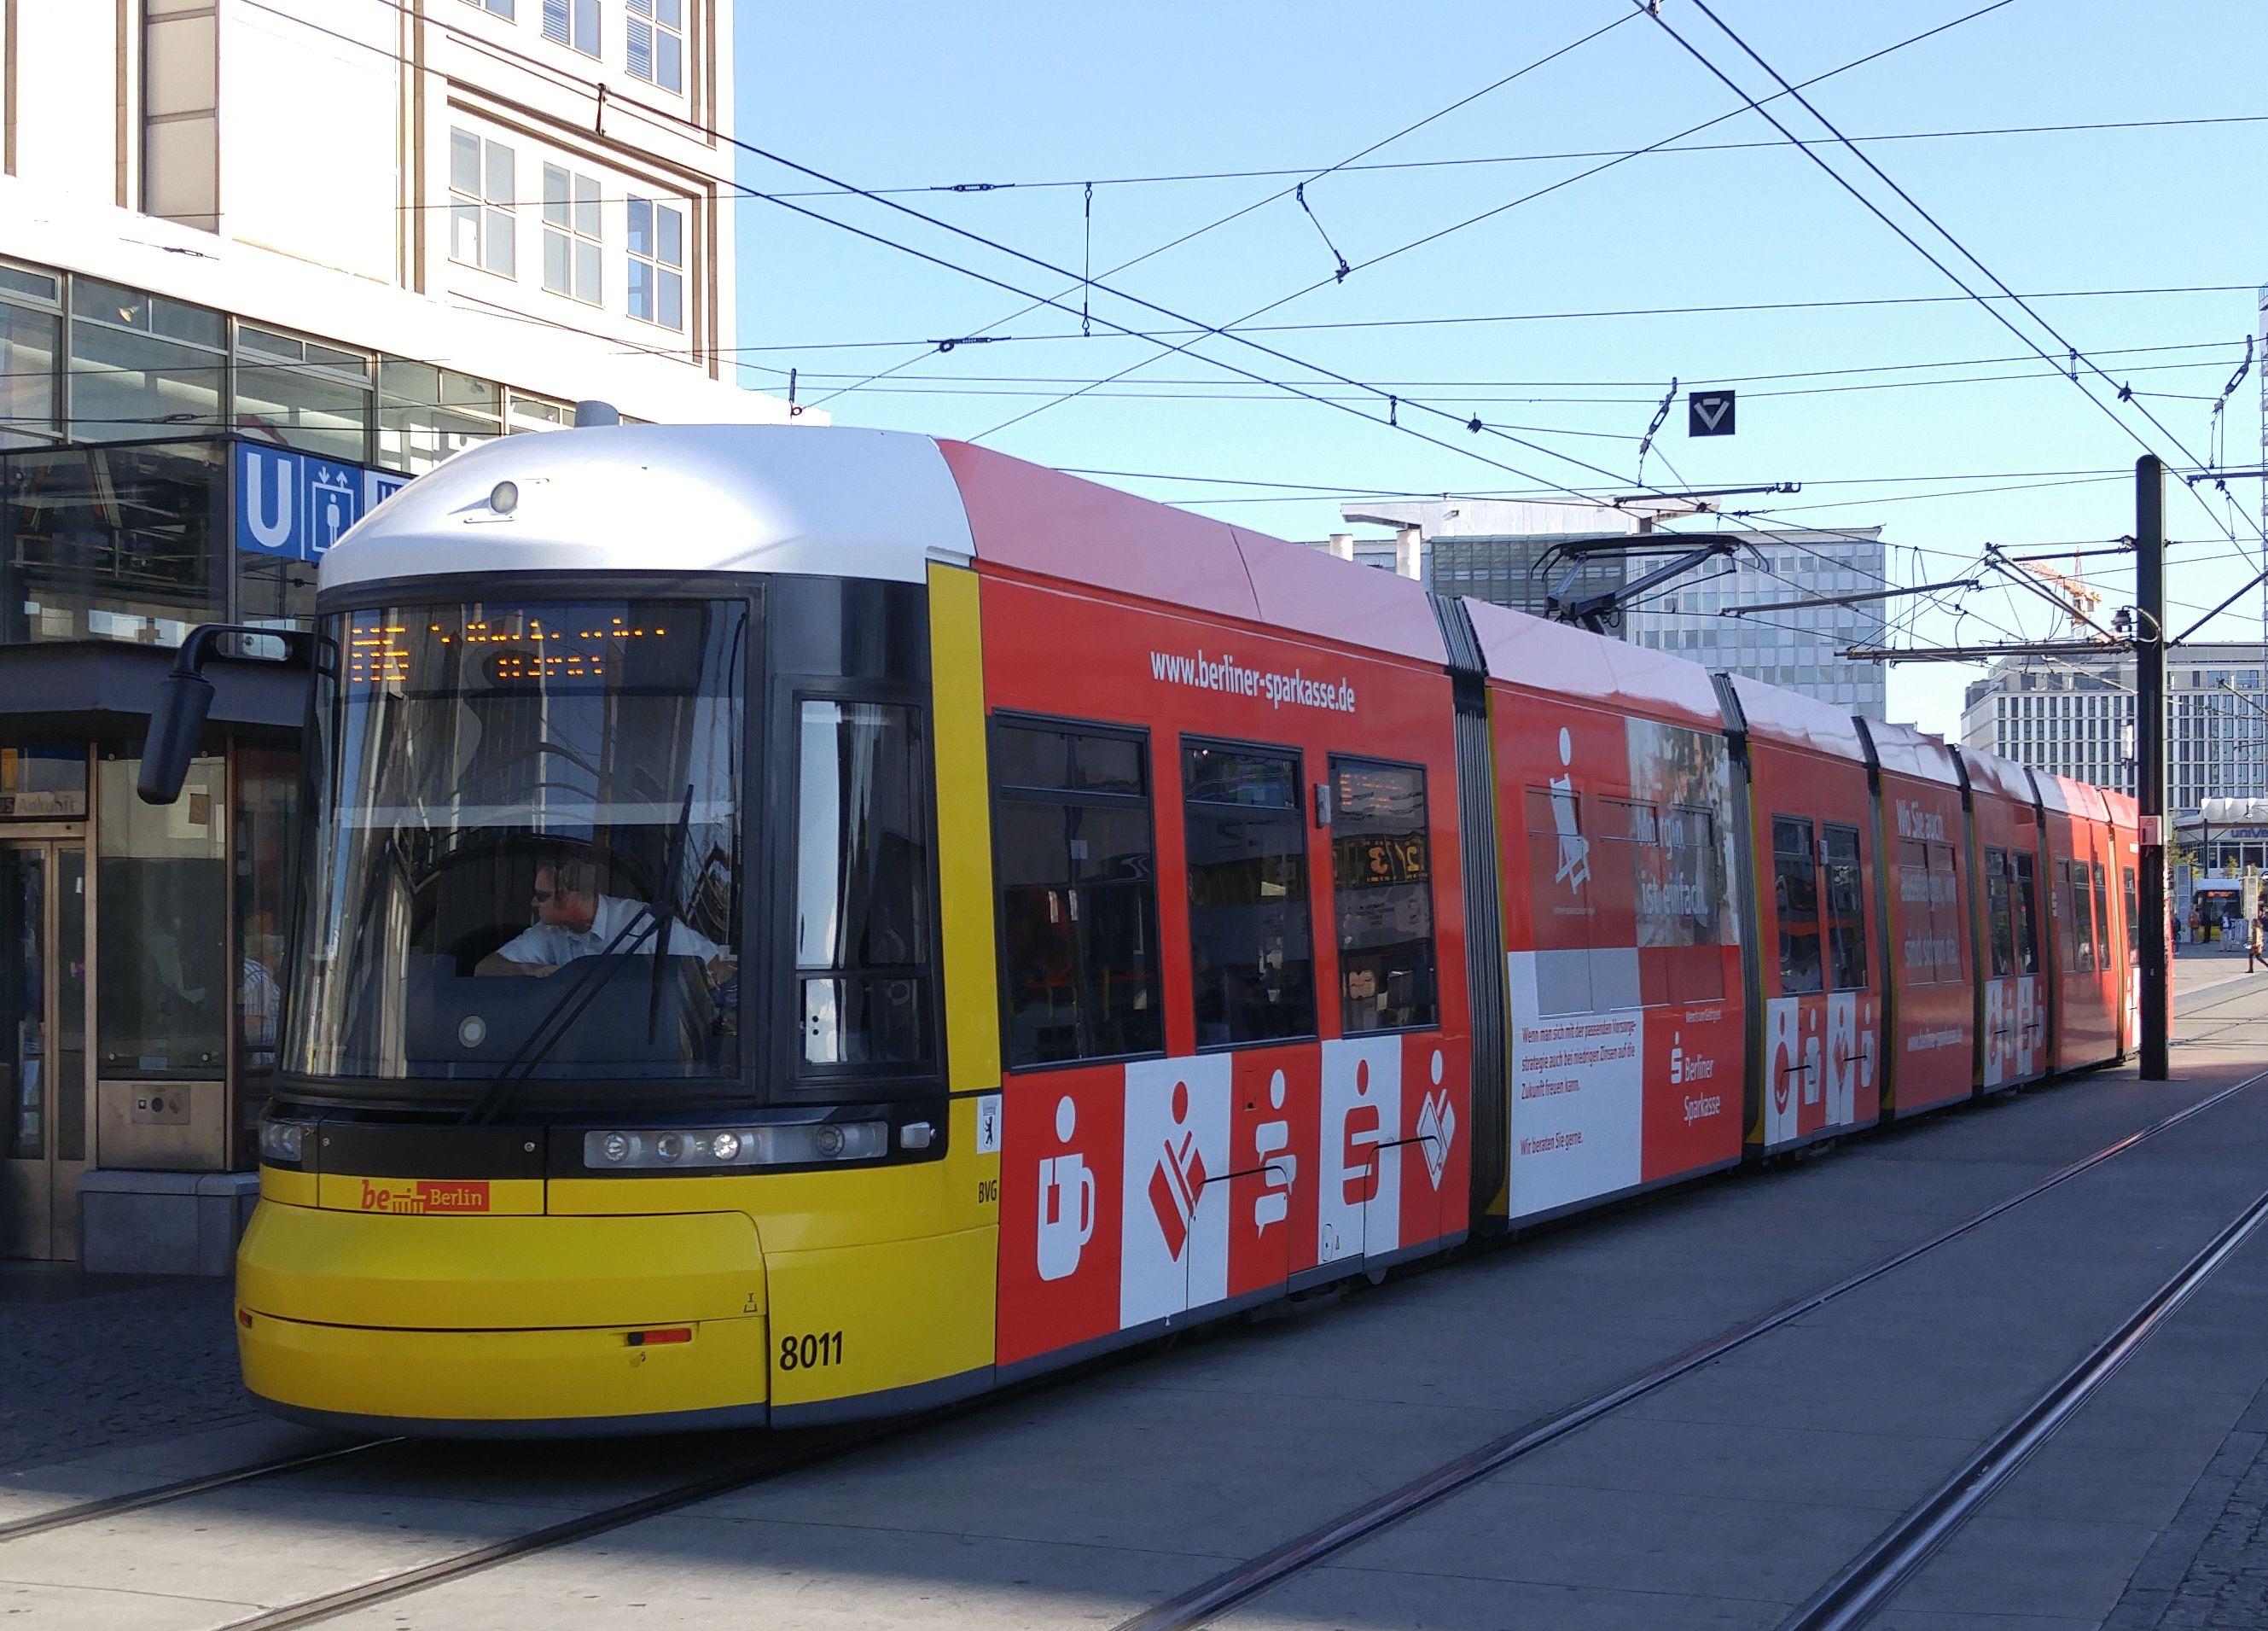 Foto: Straßenbahn 8011, Typ Flexity ERL, Alexanderplatz, 2016